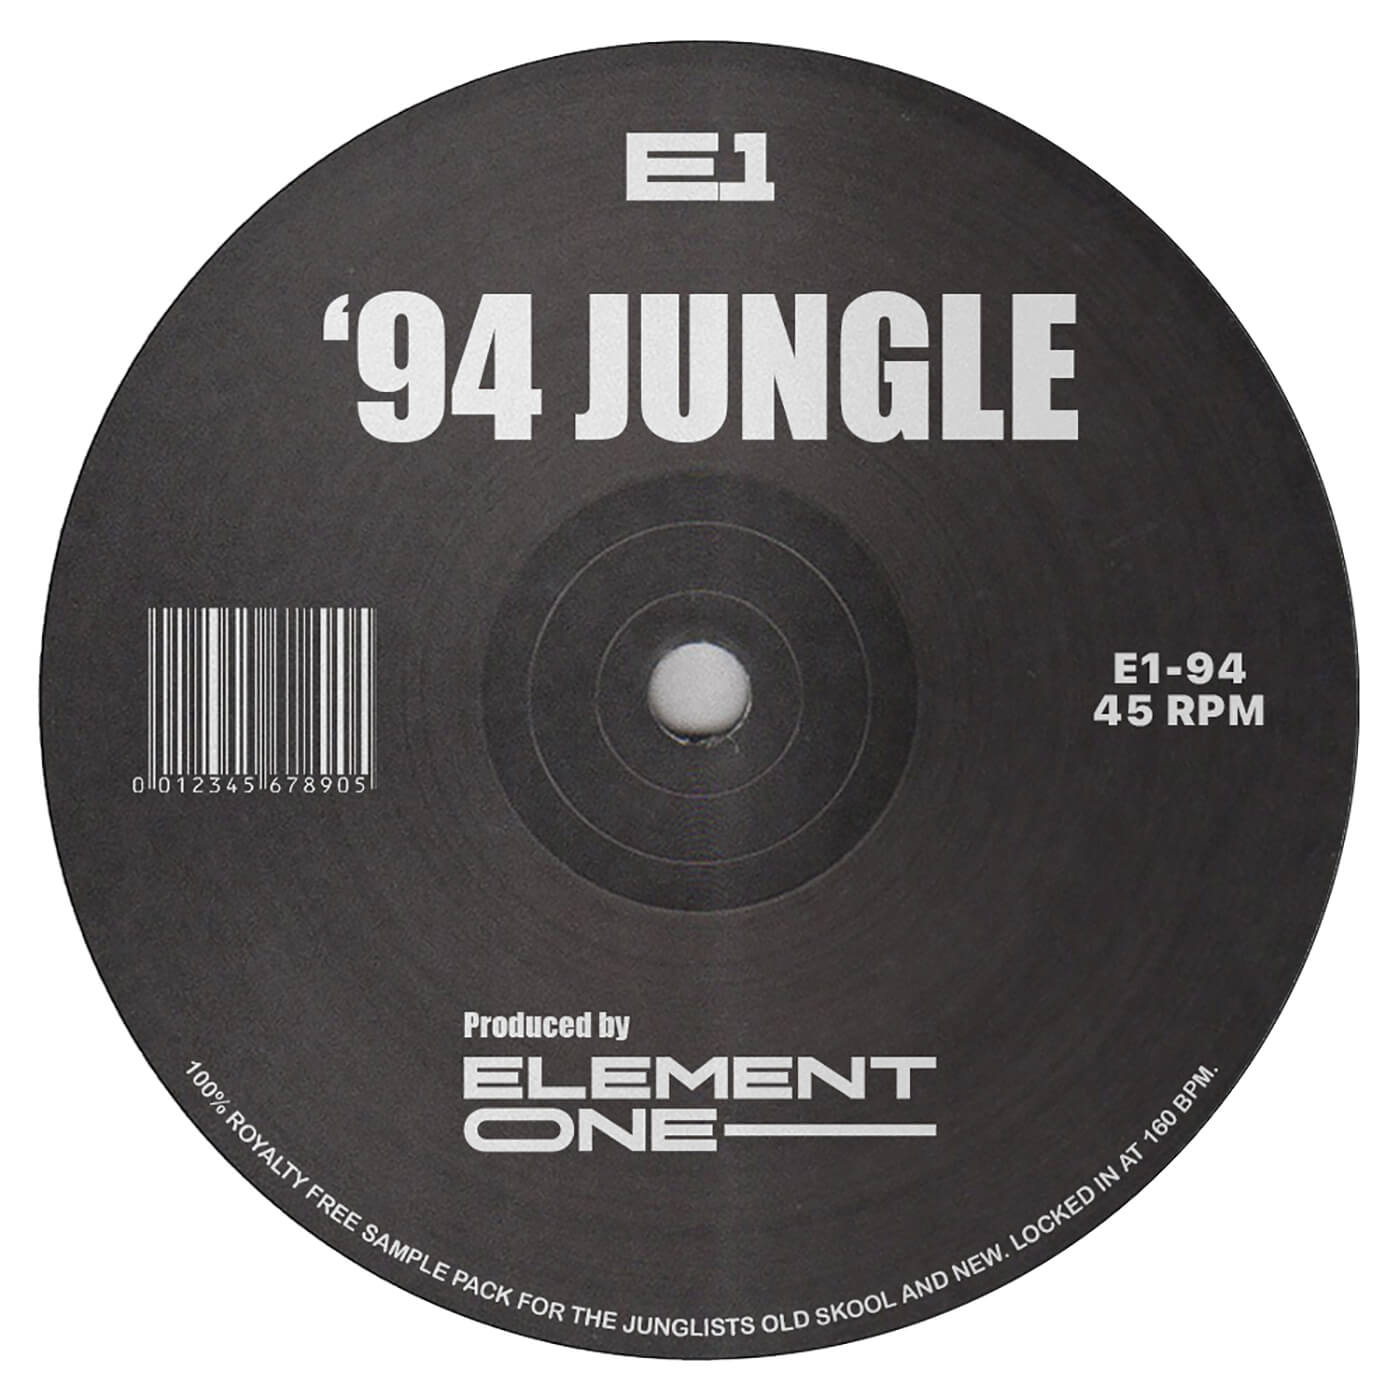 ElementOne - 94 Jungle